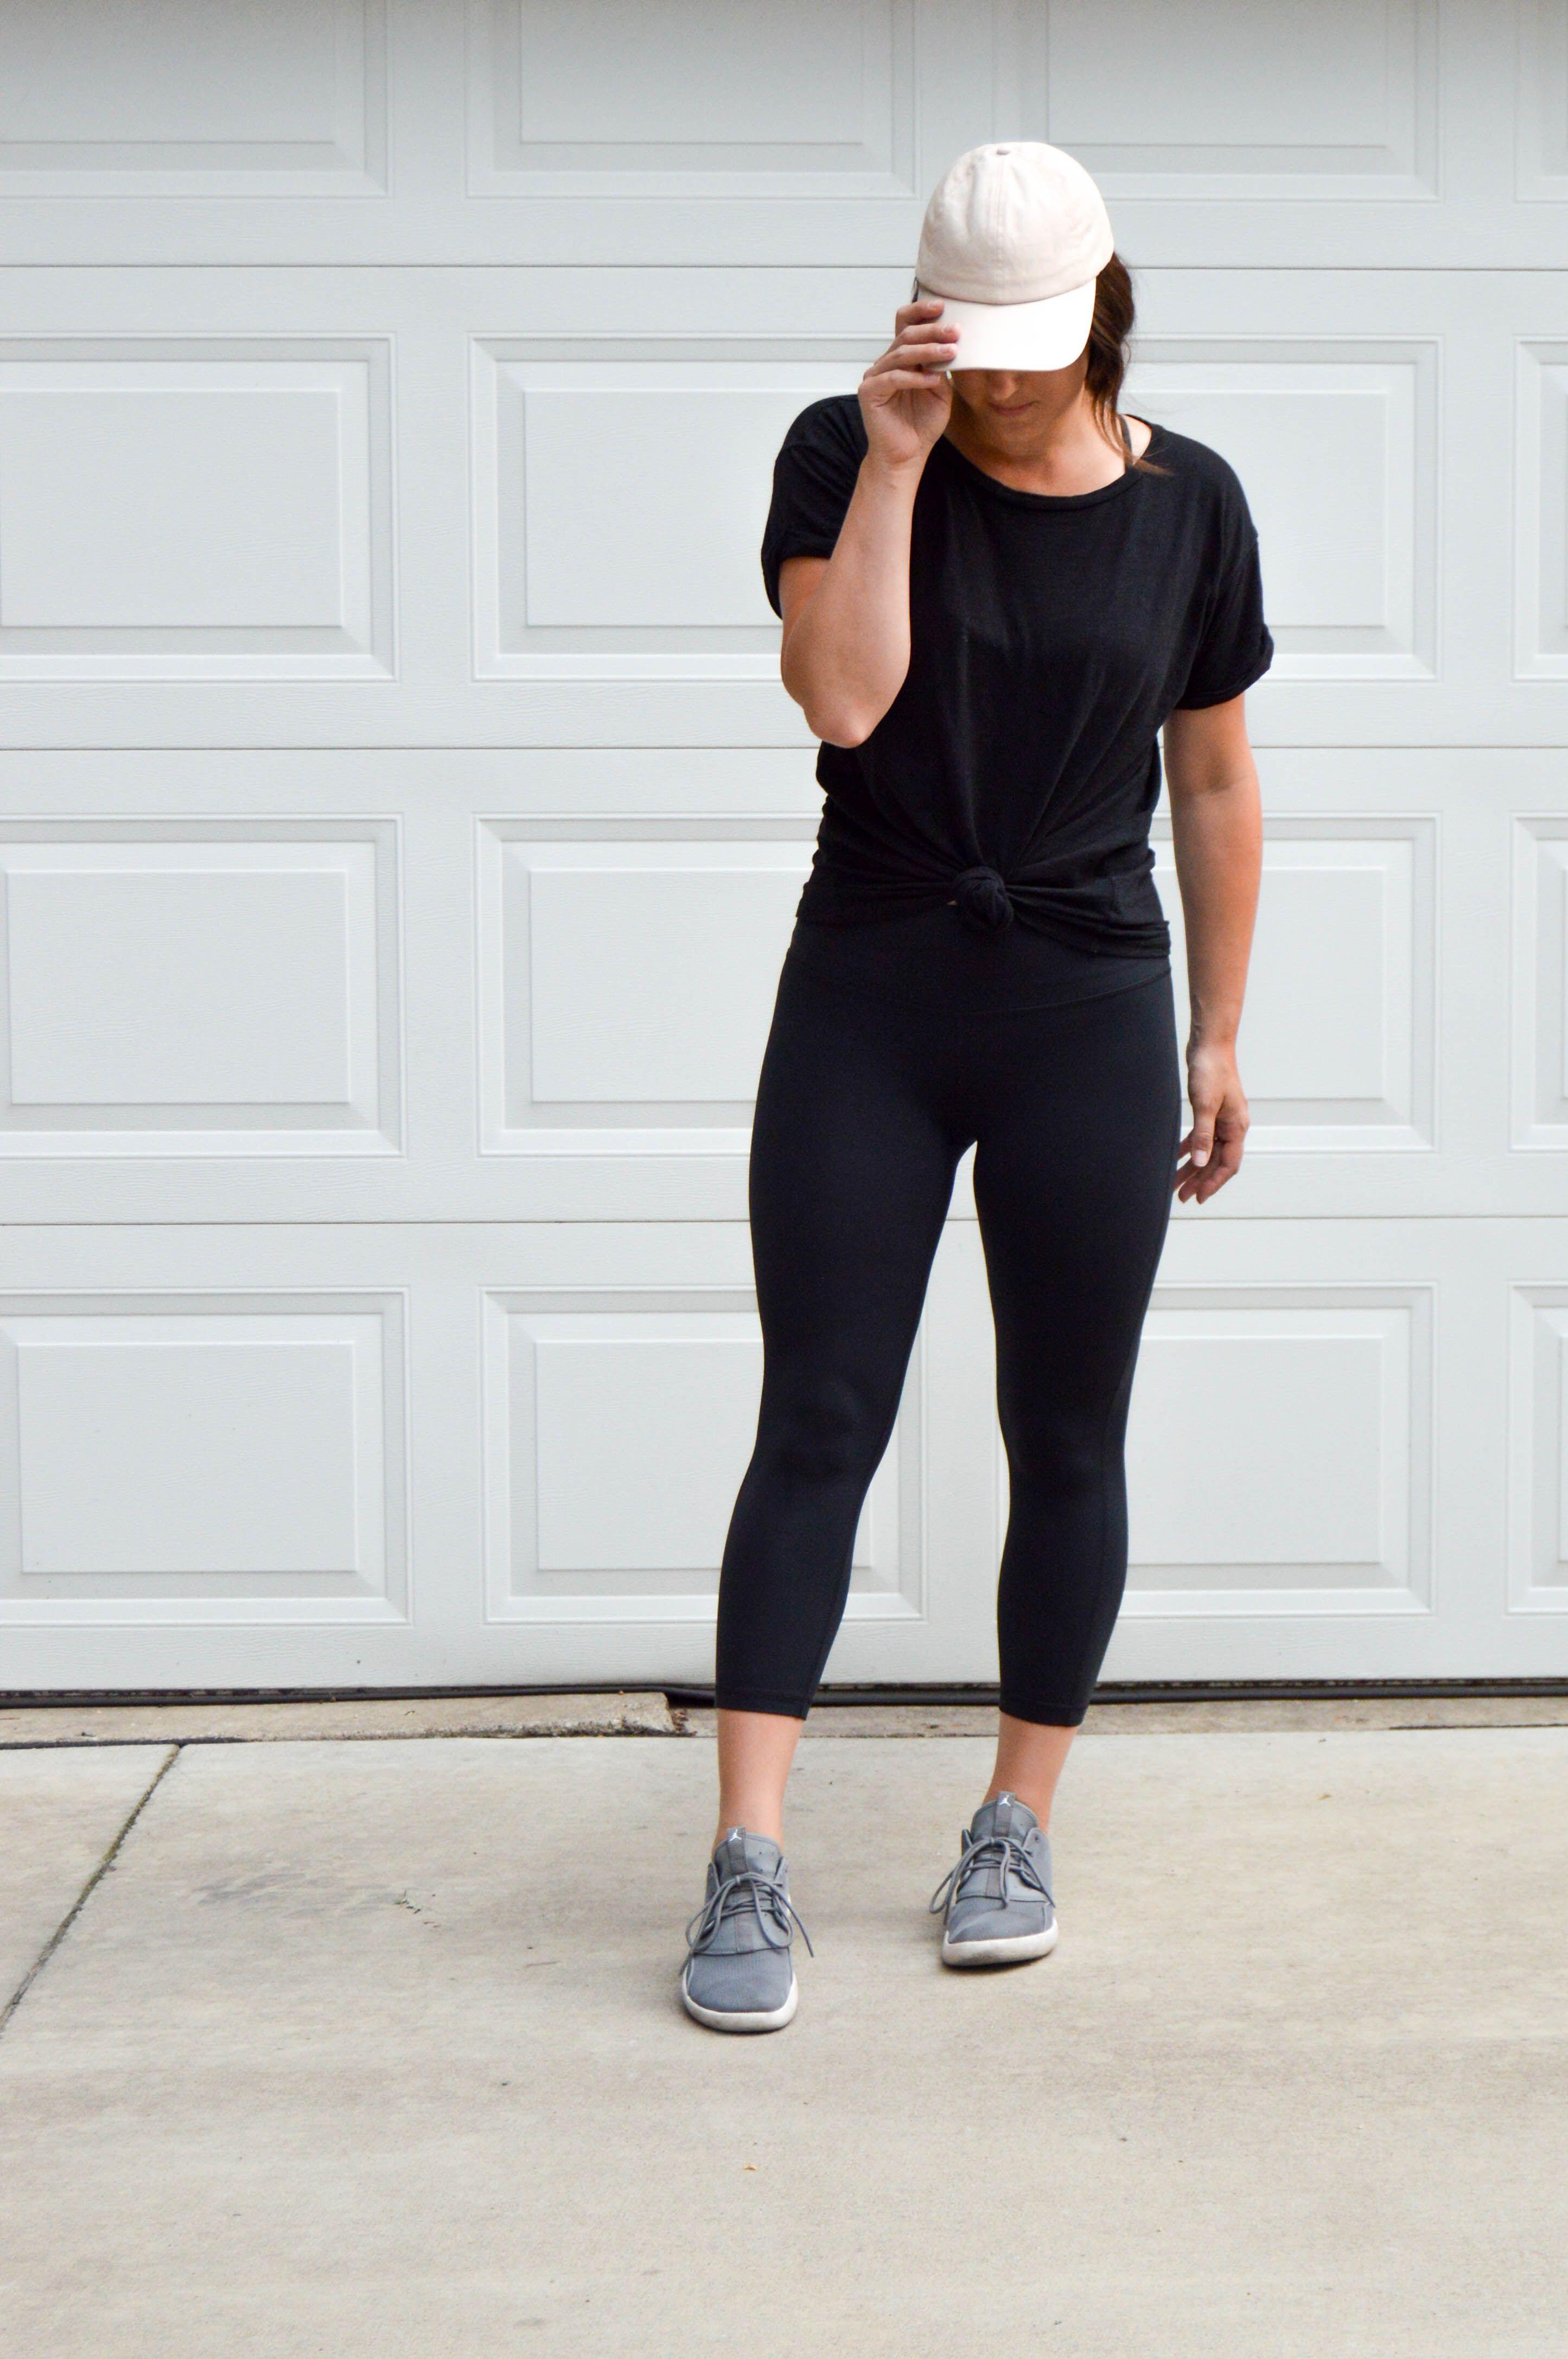 181c83e638f3a My Favorite Workout Leggings     The Blog   Workout leggings ...